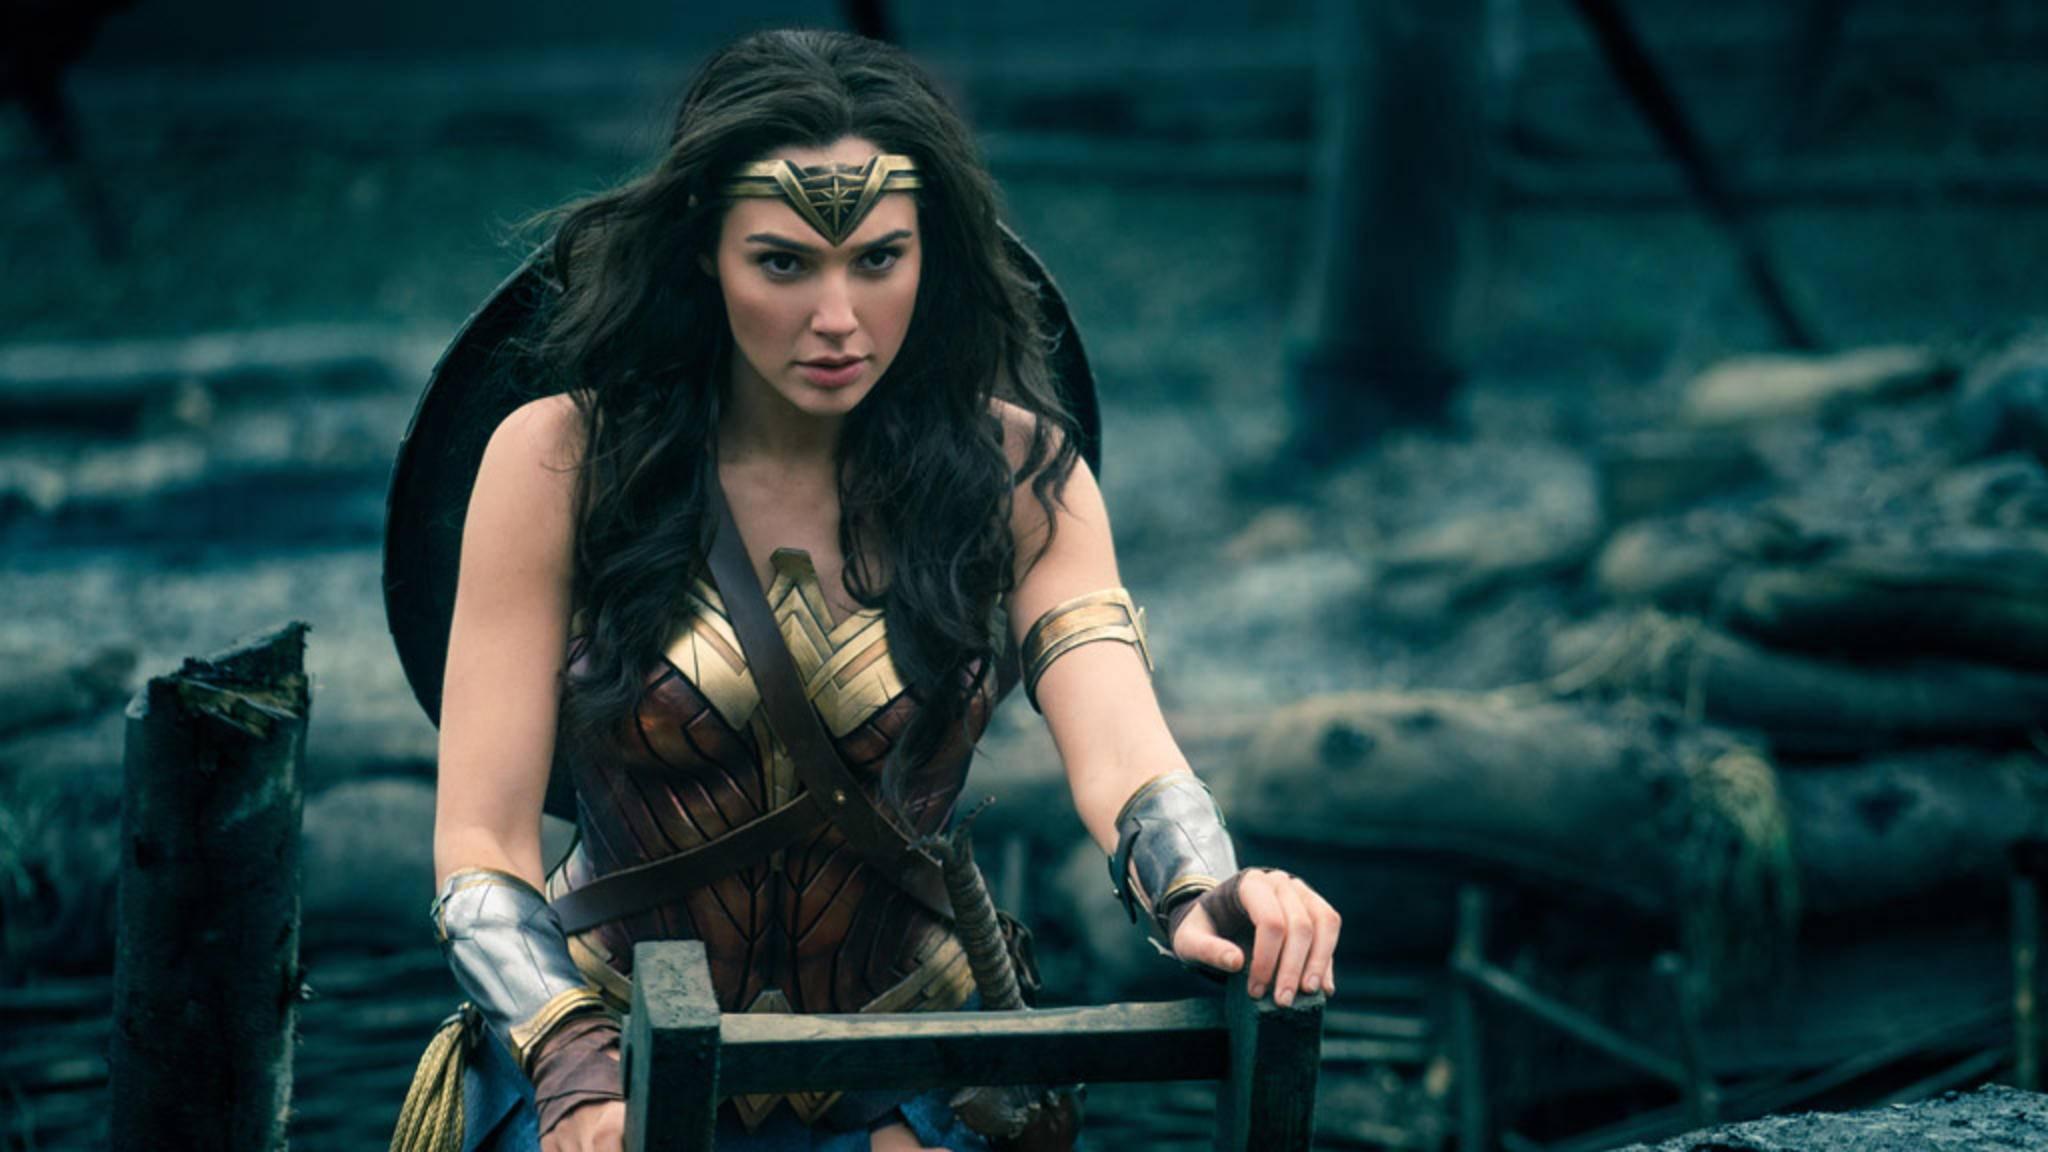 """Wonder Woman"" war bislang der größte Erfolg unter den DCEU-Filmen. 2019 soll ein Sequel folgen."